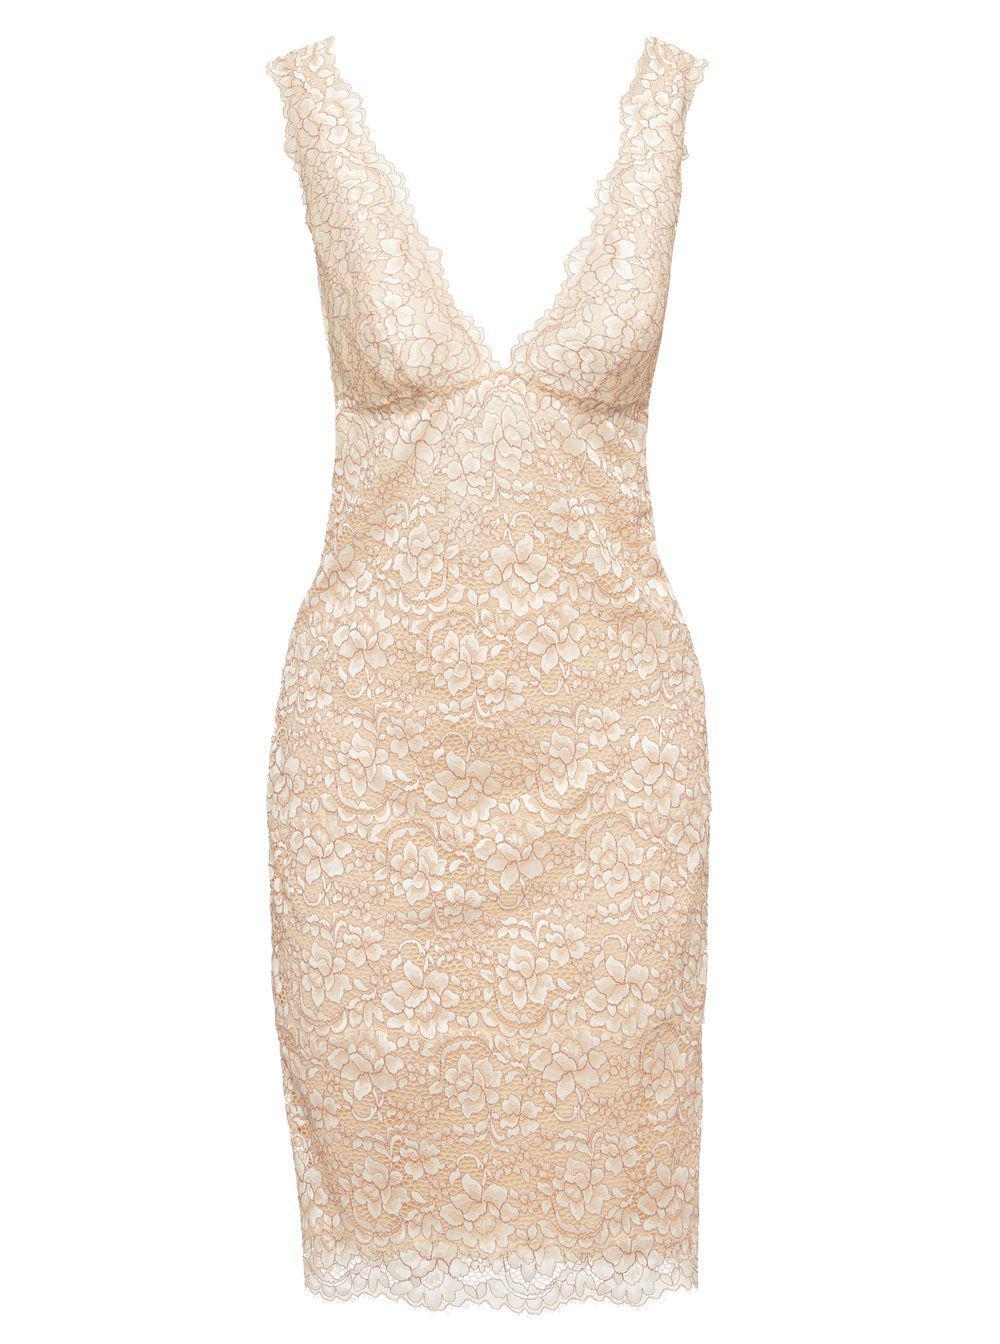 Lyst cosabella pret a porter lace dress in white for Pret a porter uk